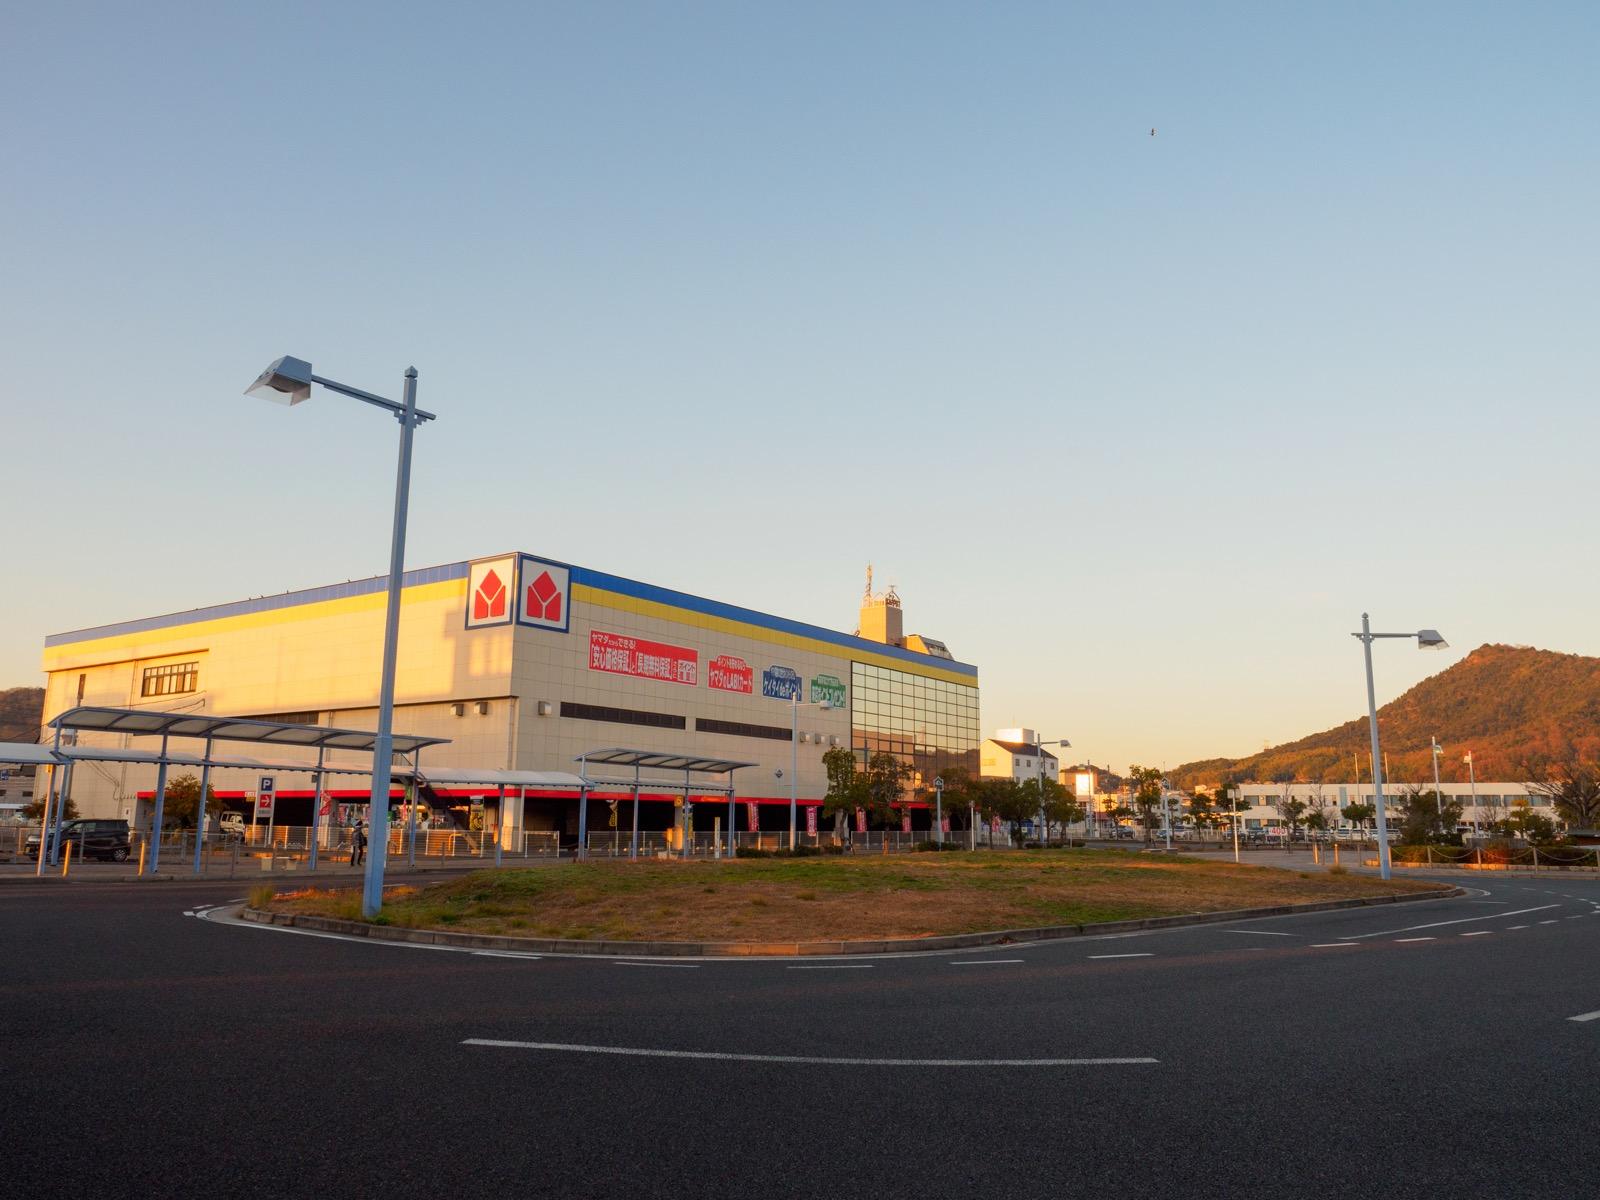 児島駅西口の駅前